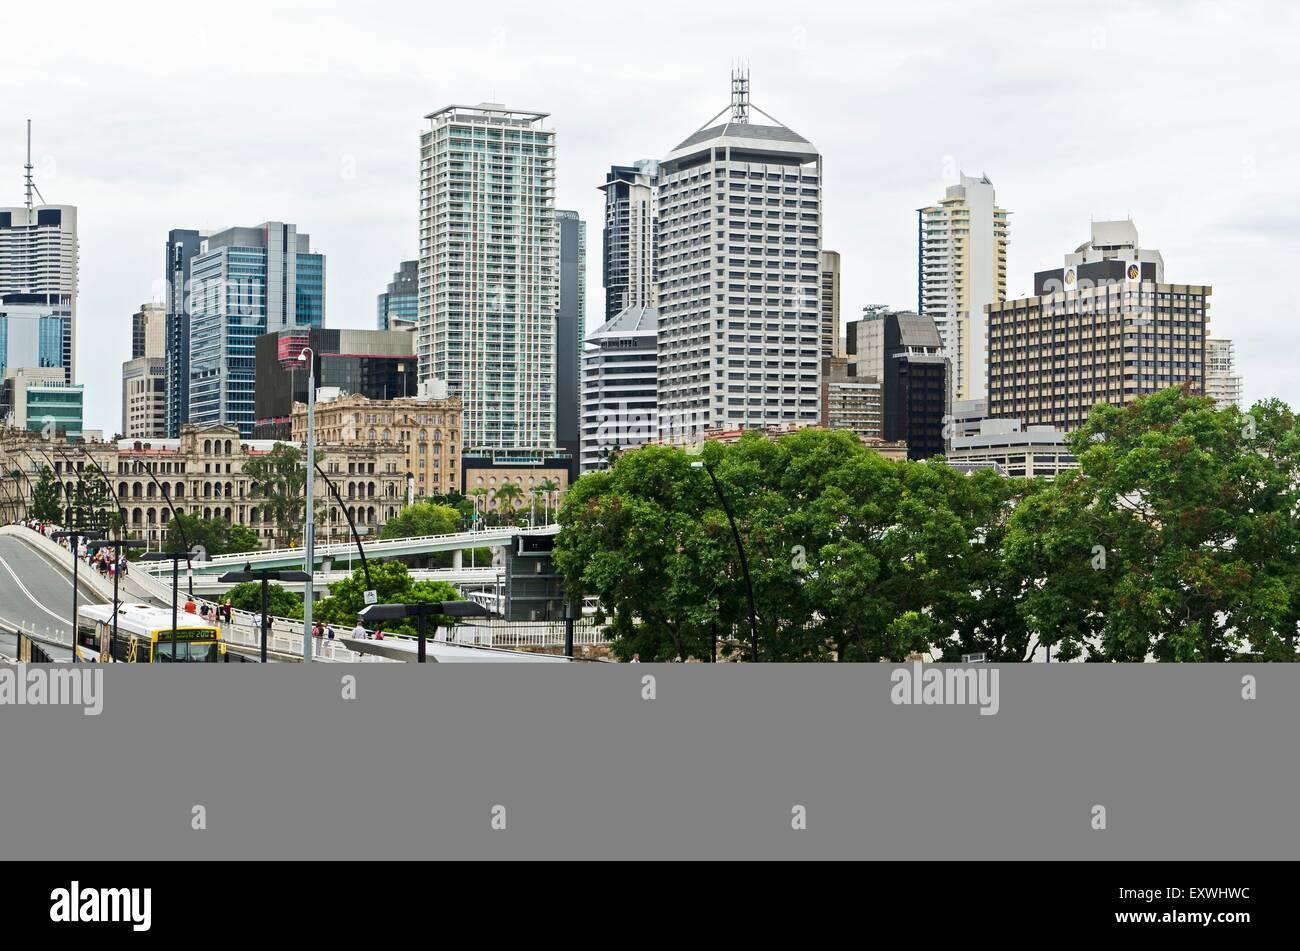 Skyline, Brisbane, Queensland, Australia - Stock Image